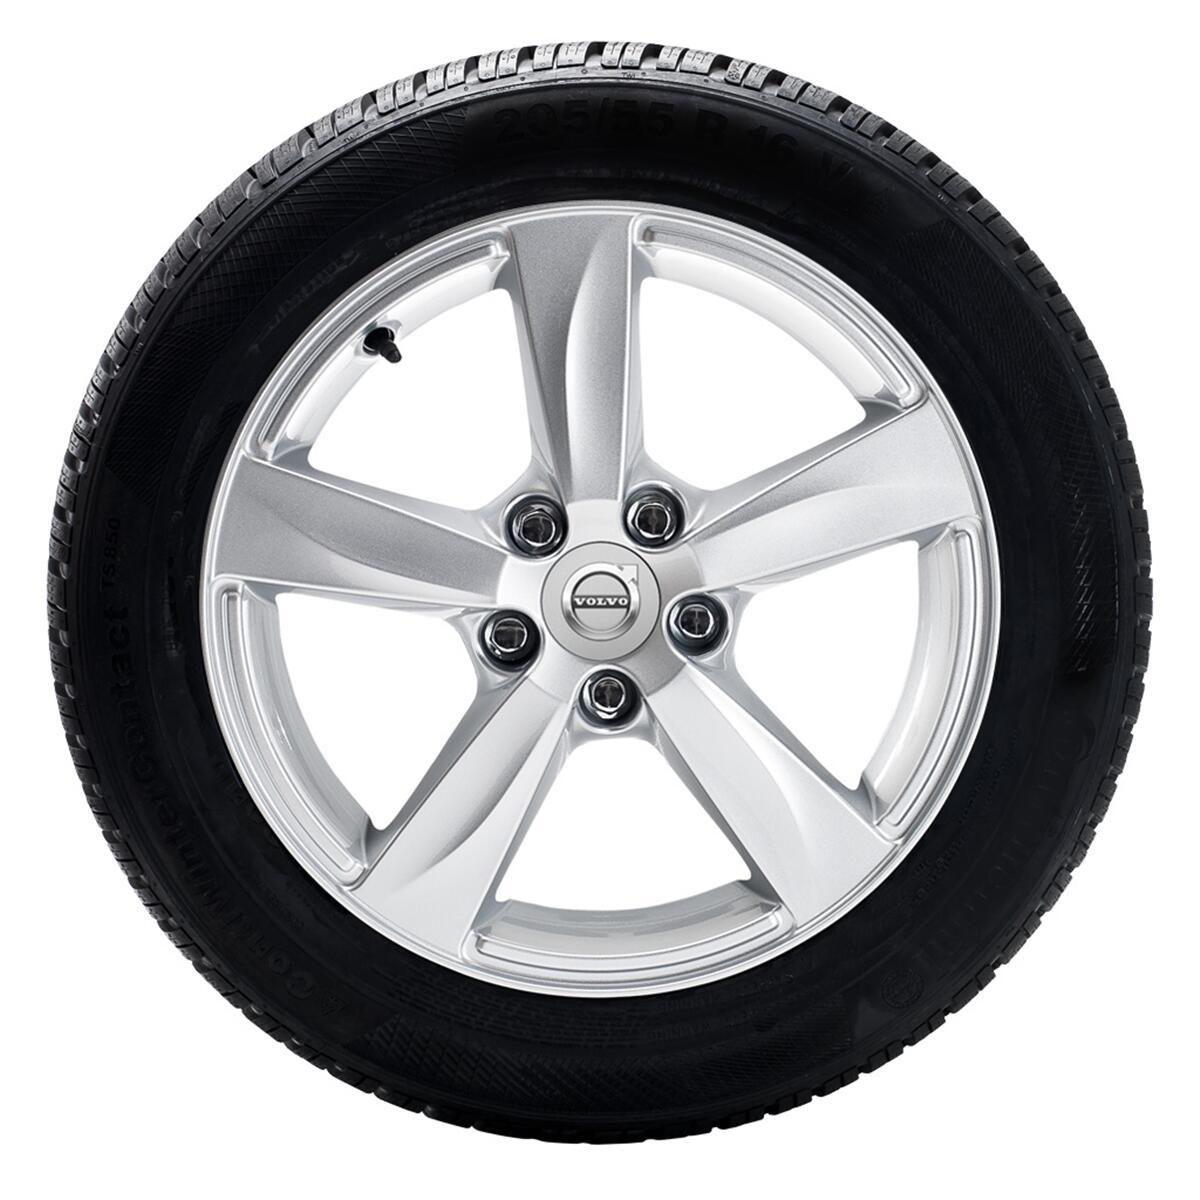 Komplet zimskih koles 40,64 cm (16''); pnevmatike Continental